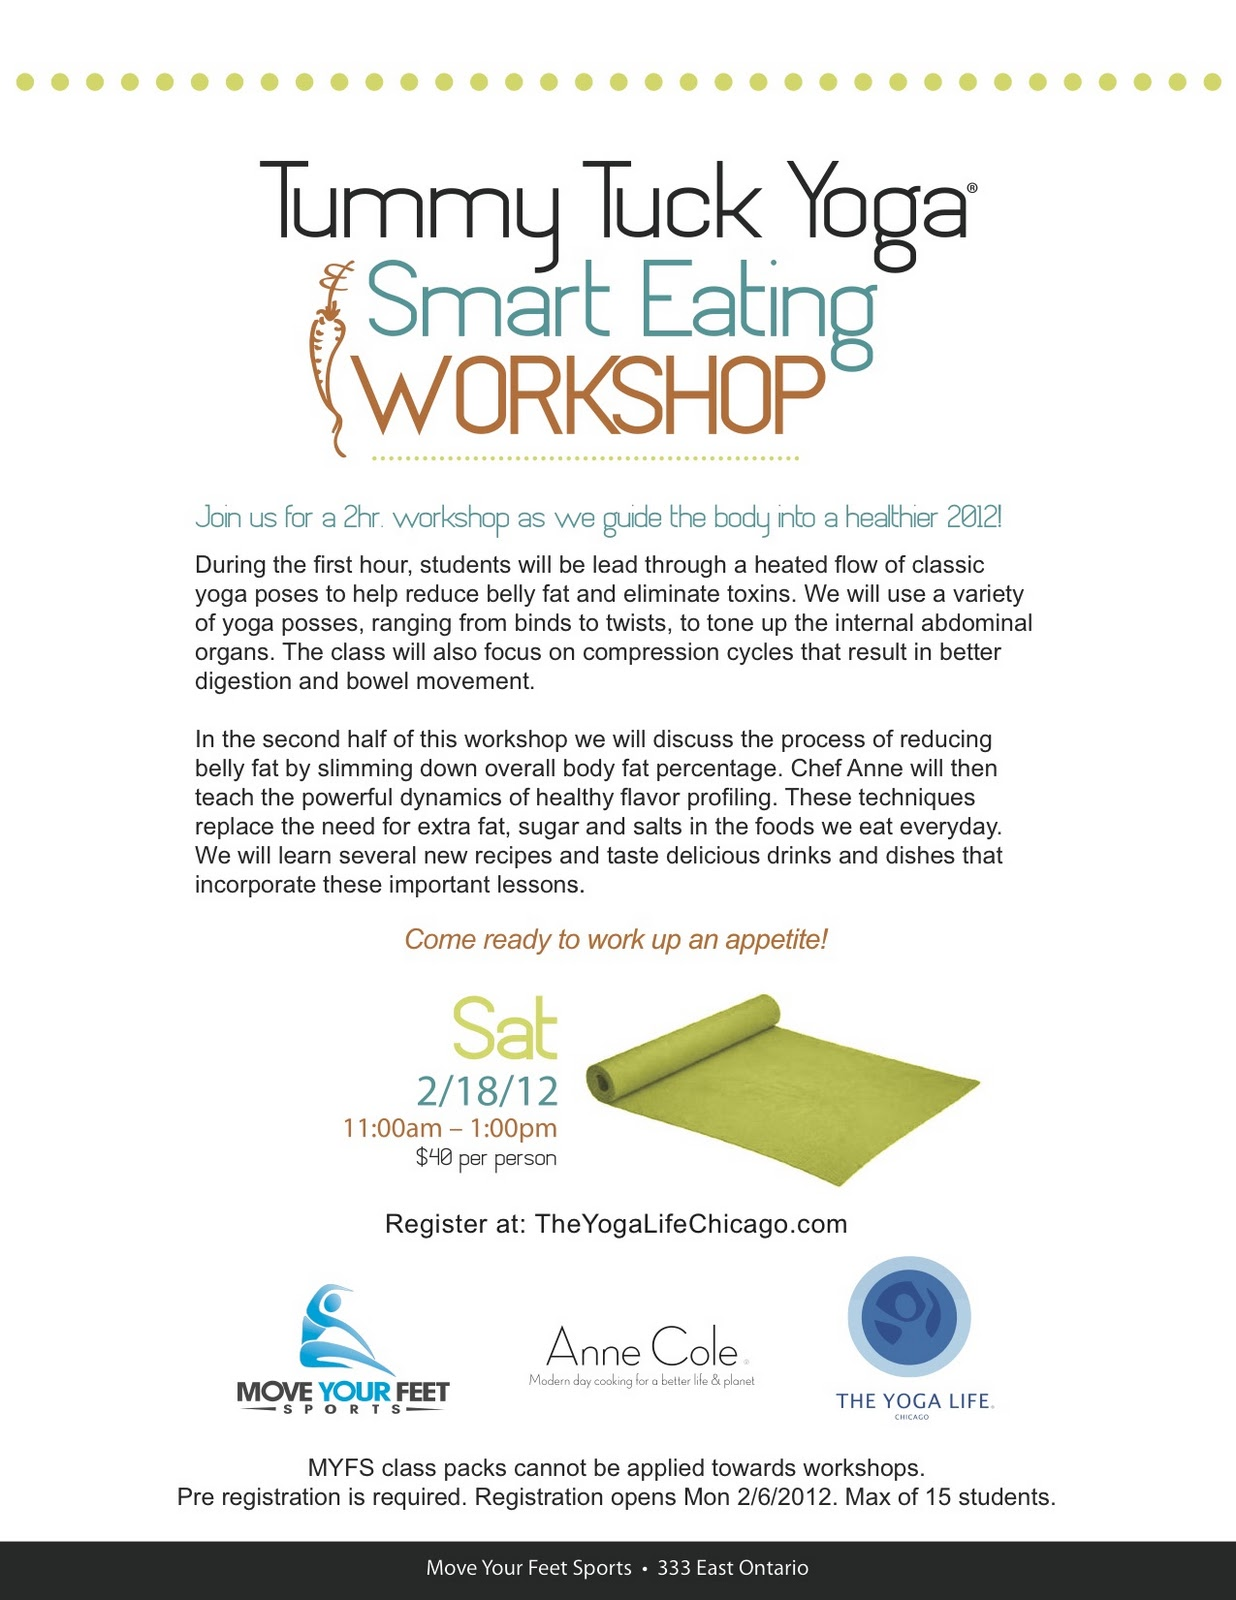 The Yoga Life Chicago: Tummy Tuck Yoga & Smart Eating Workshop